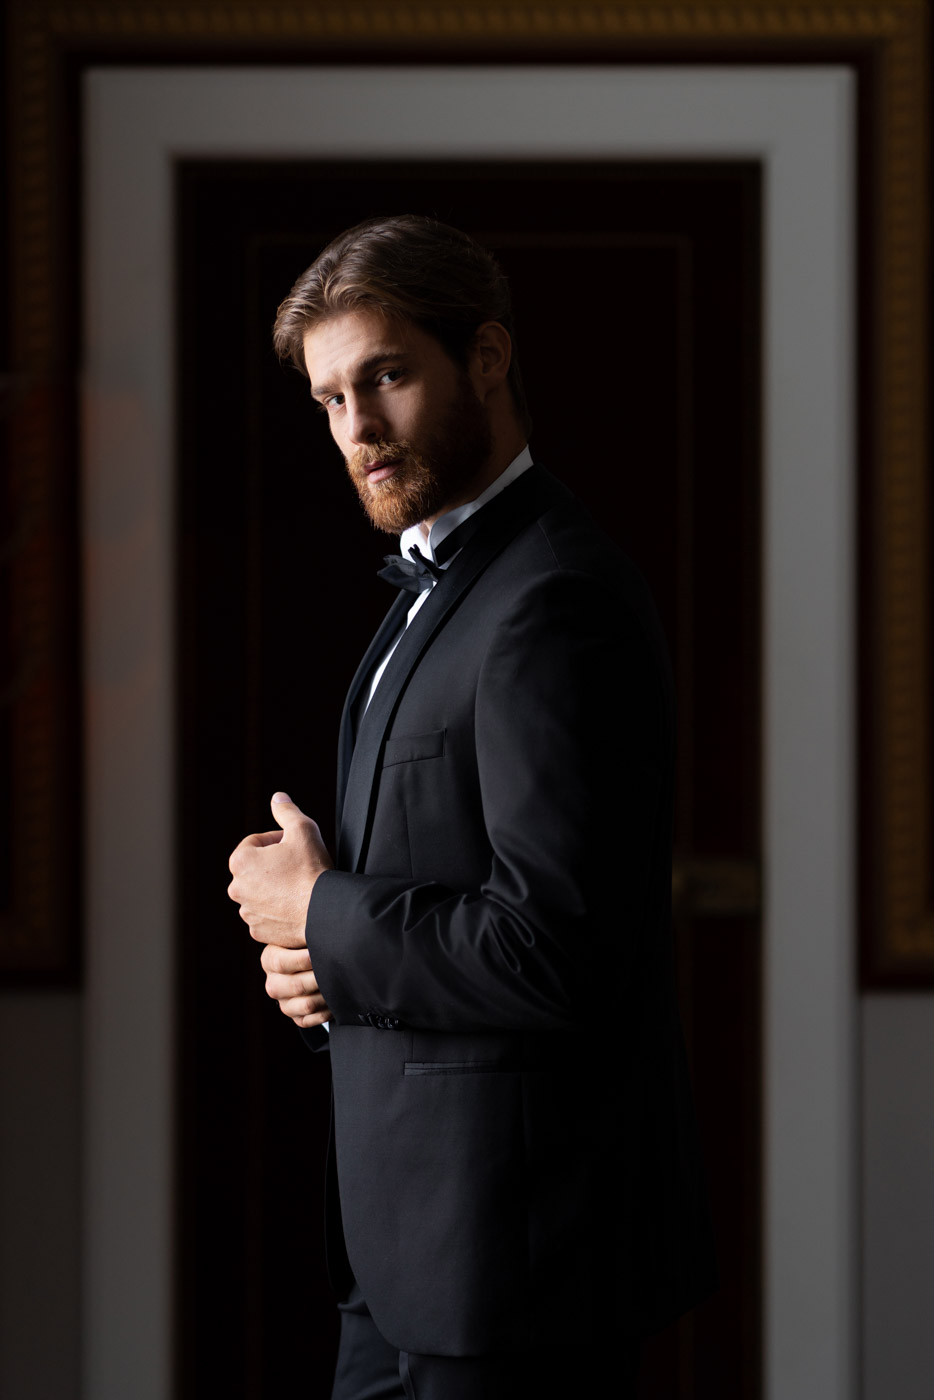 Stylish groom in a black tux at Villa Astor, Sorrento, Italy - photo by Adagion Studio